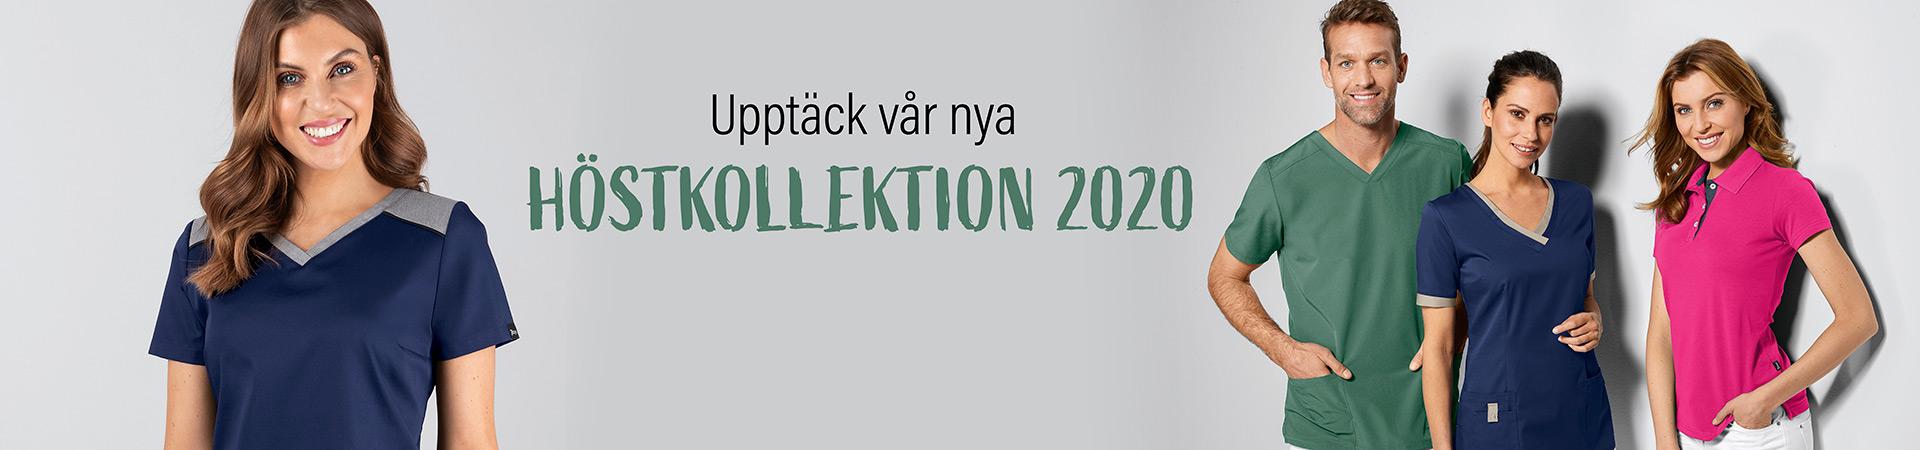 Höstkollektion 2020 7days